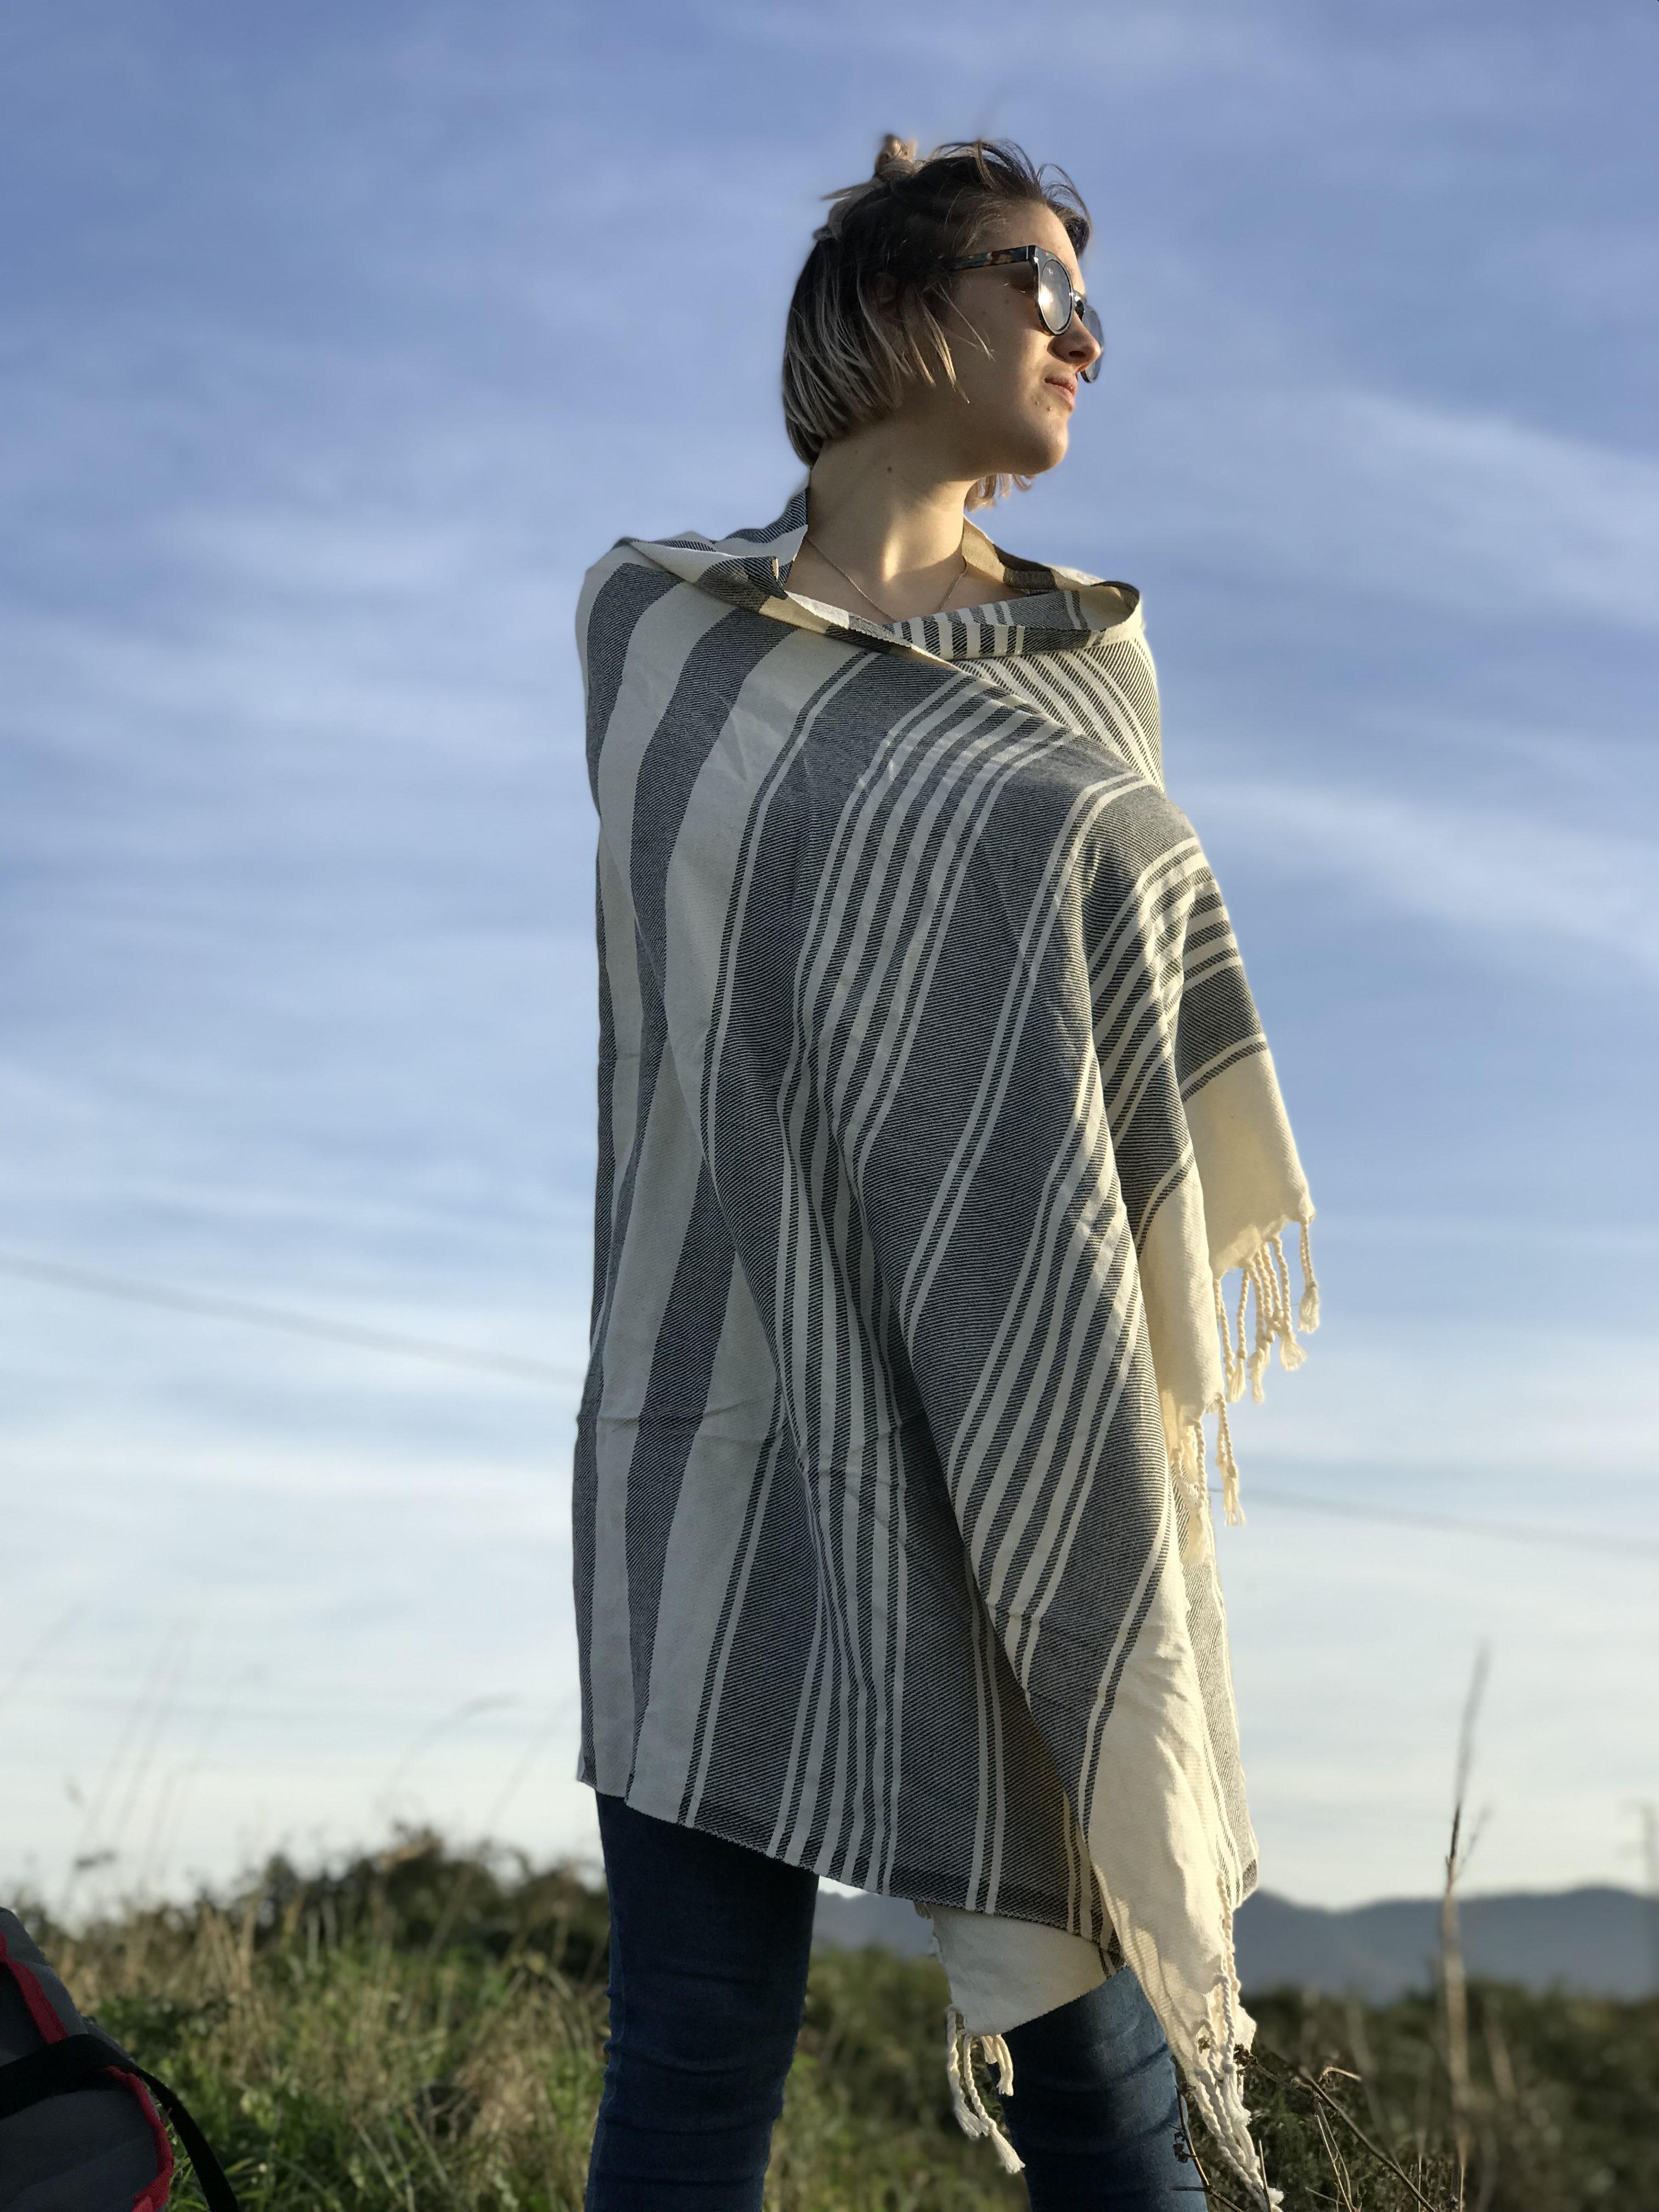 Van Life Clothing - Turkish Towel